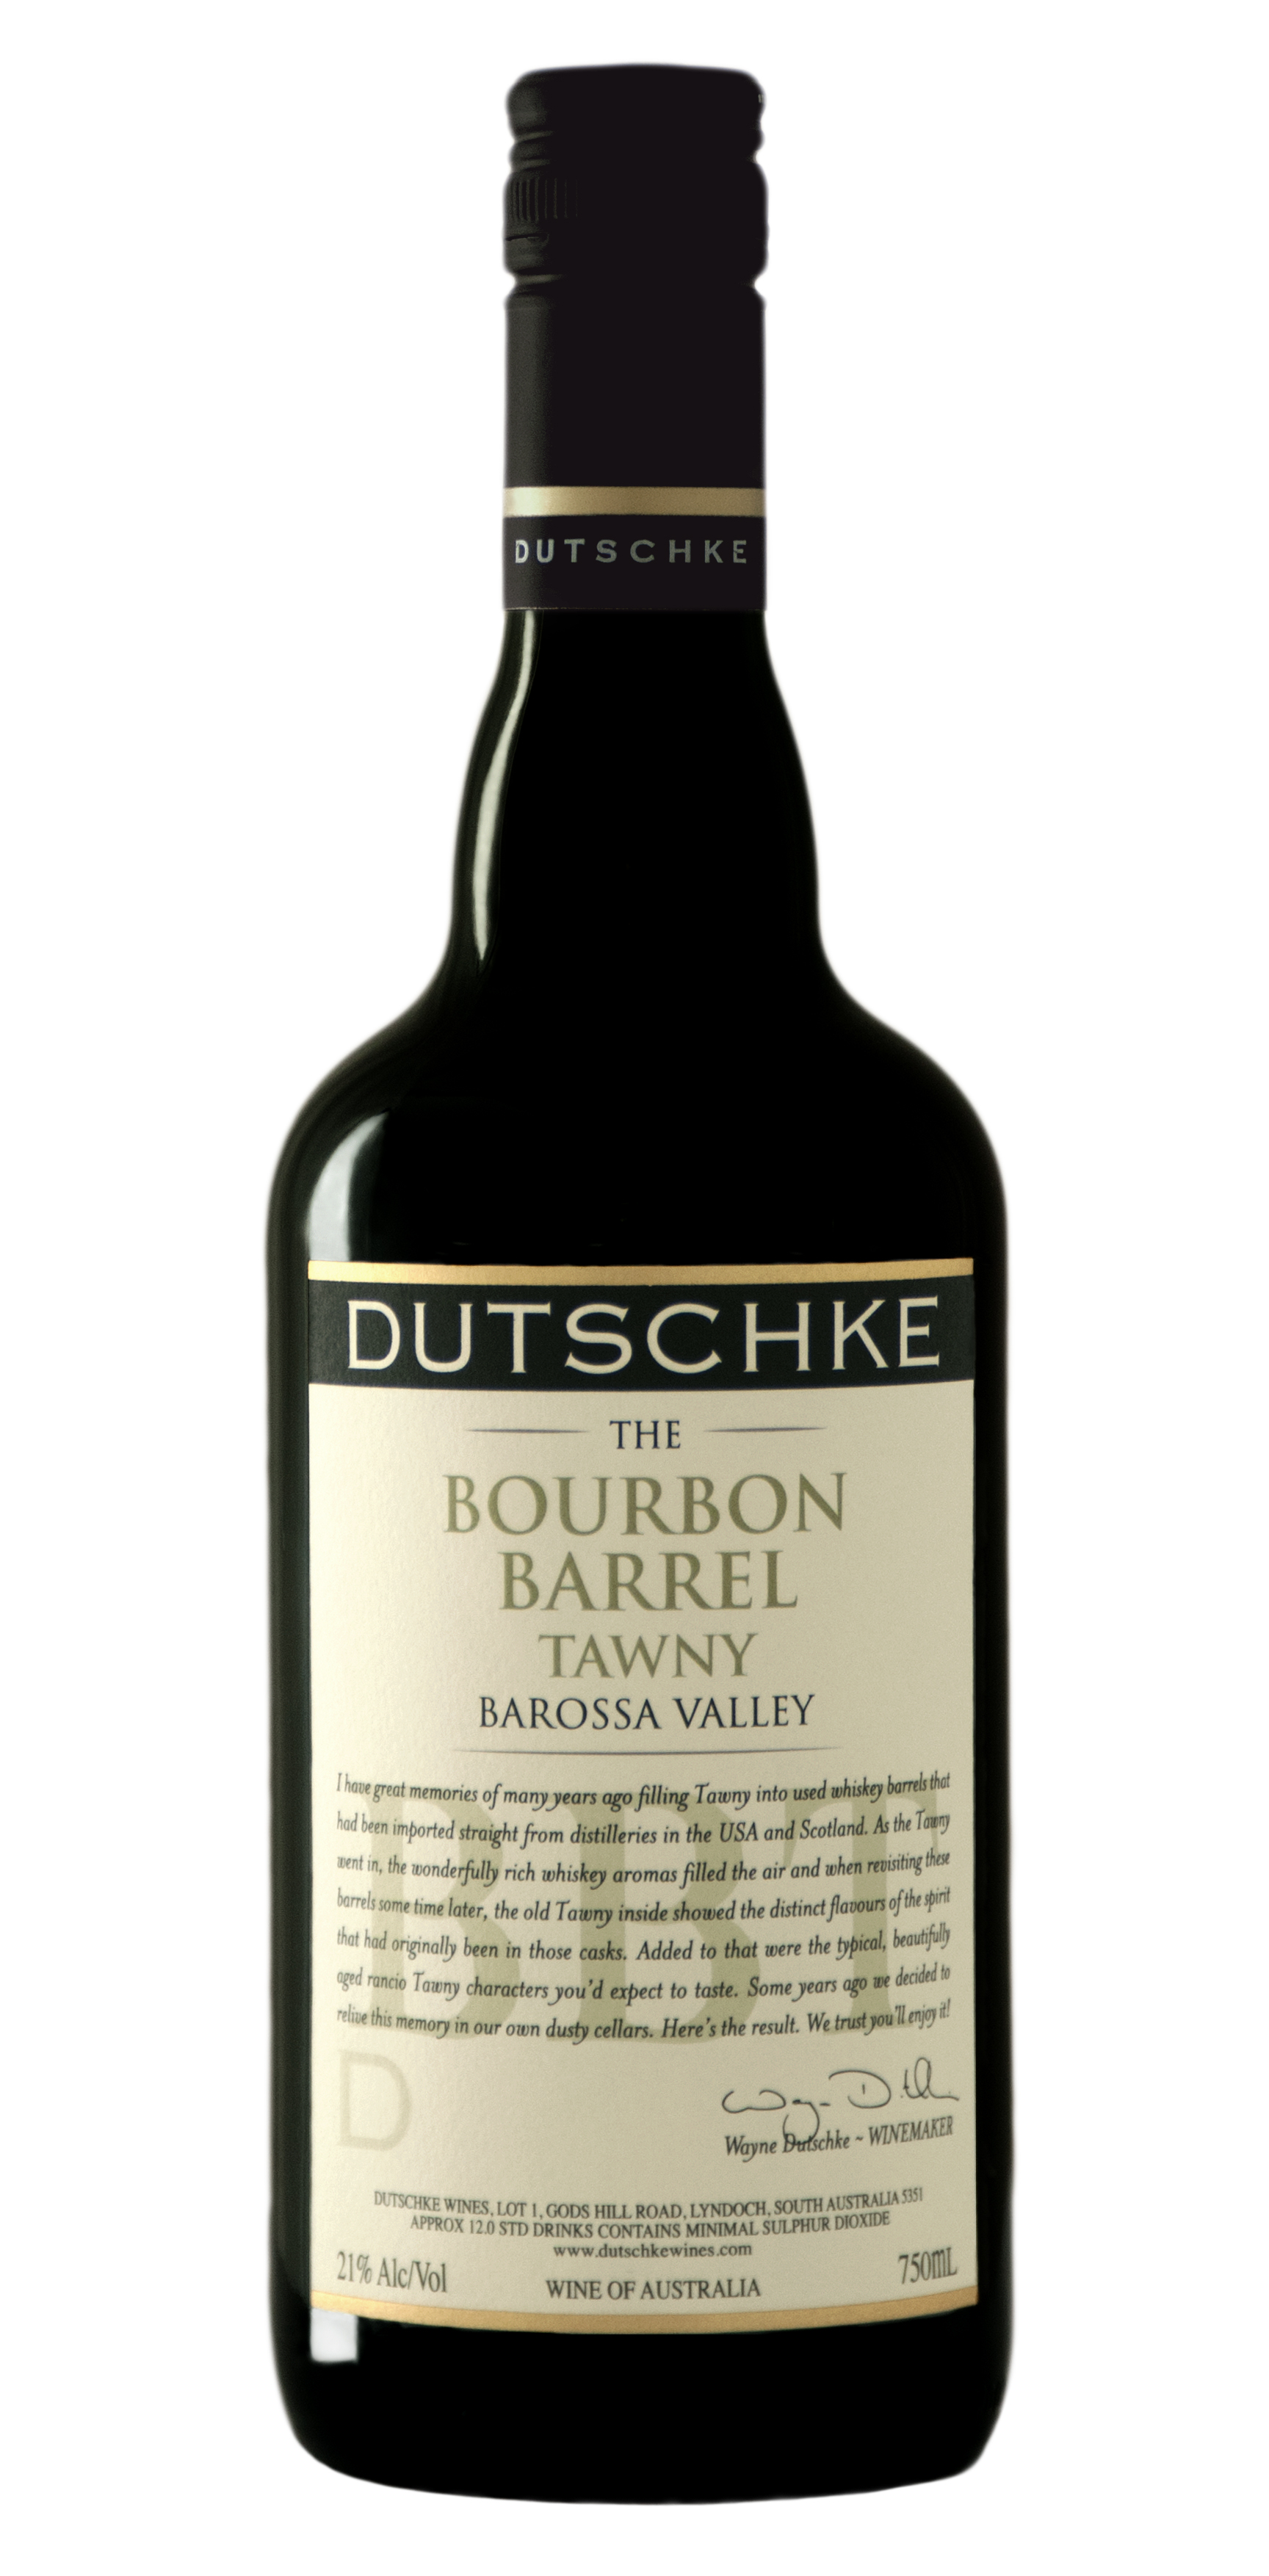 Dutschke Bourbon Barrel Tawny